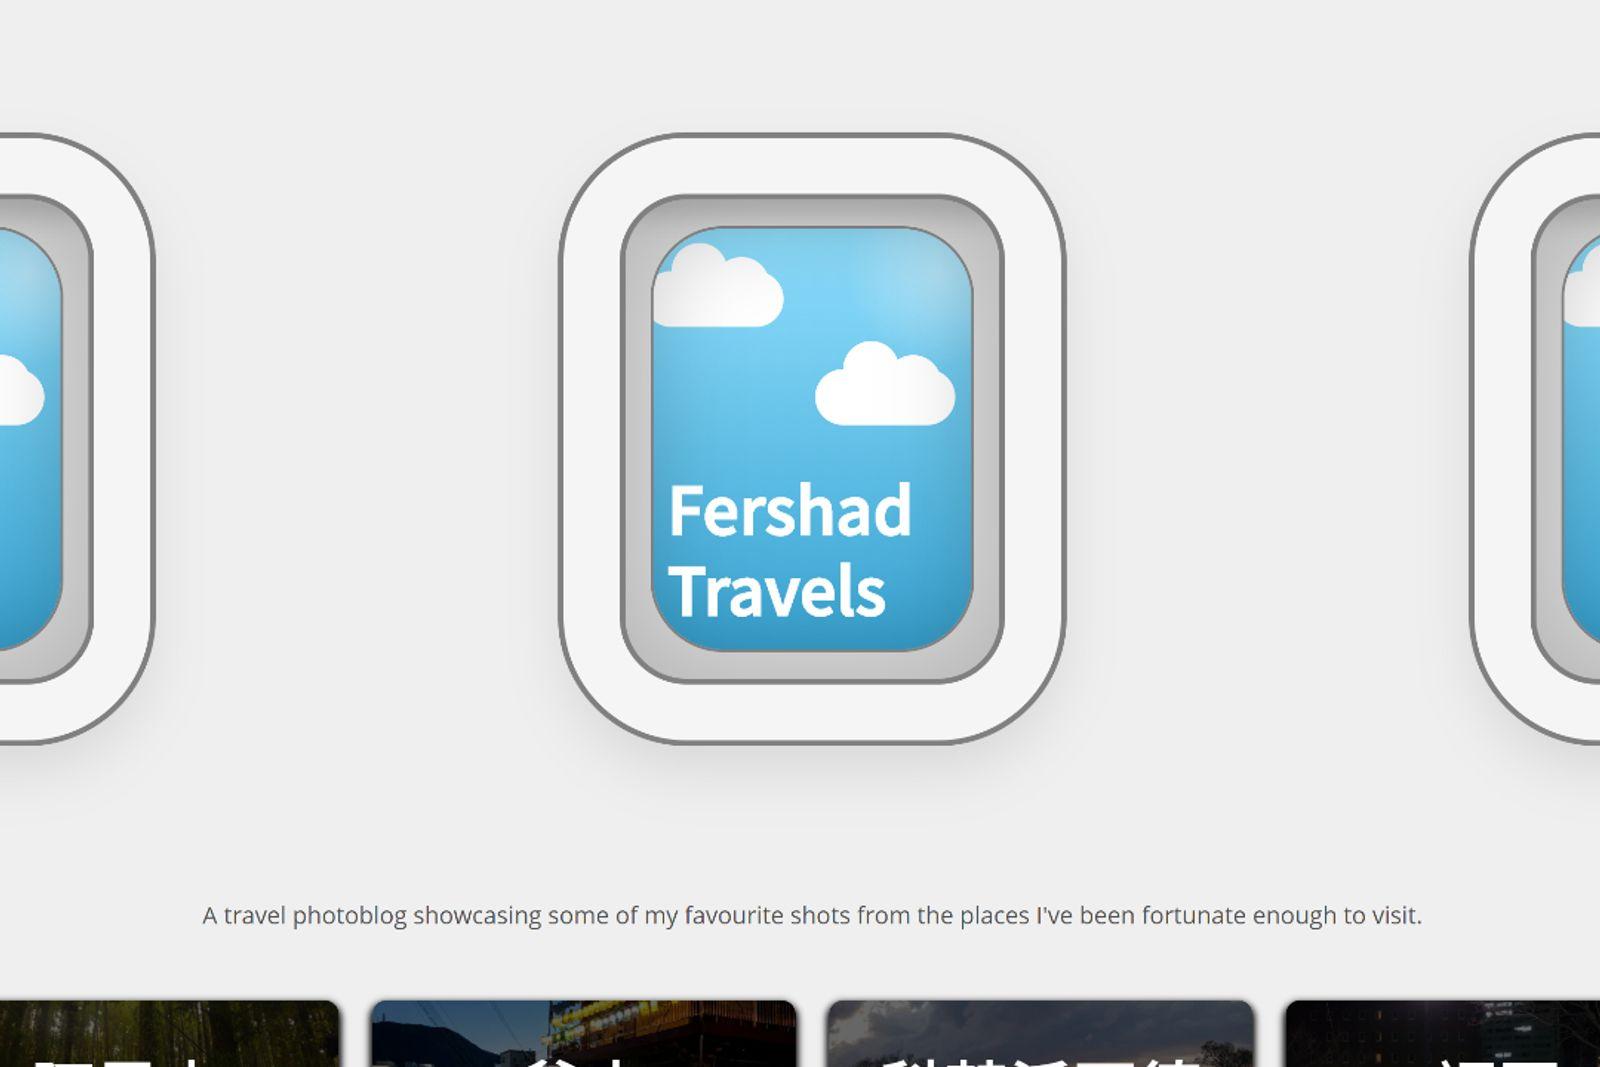 Web development case study project fershad travels.